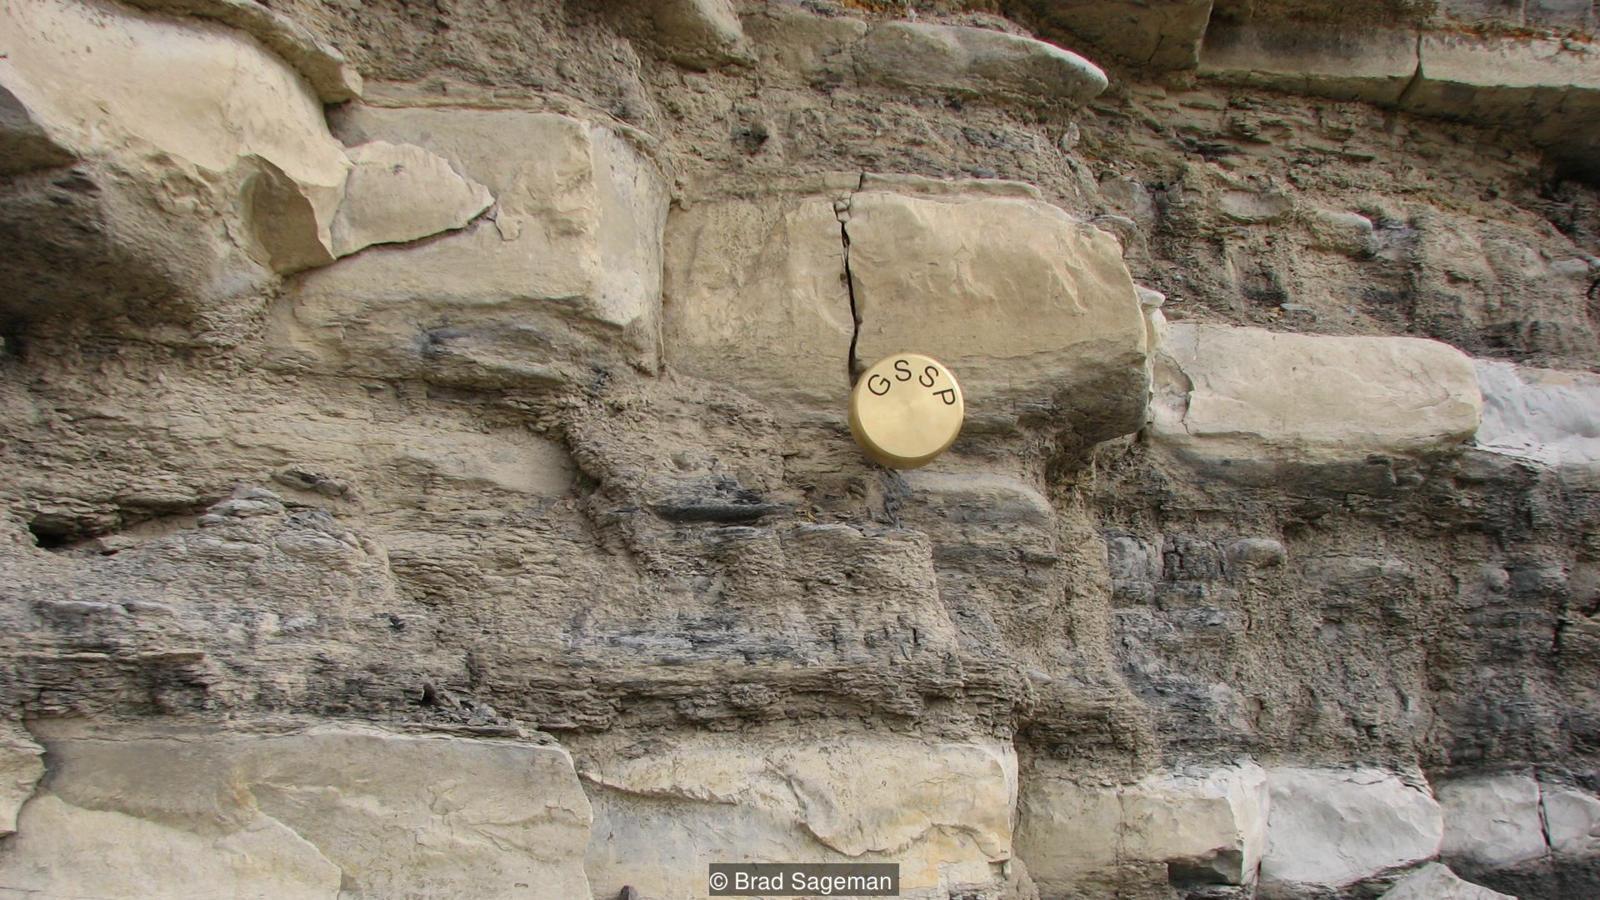 Каким местом на Земле можно отметить начало антропоцена